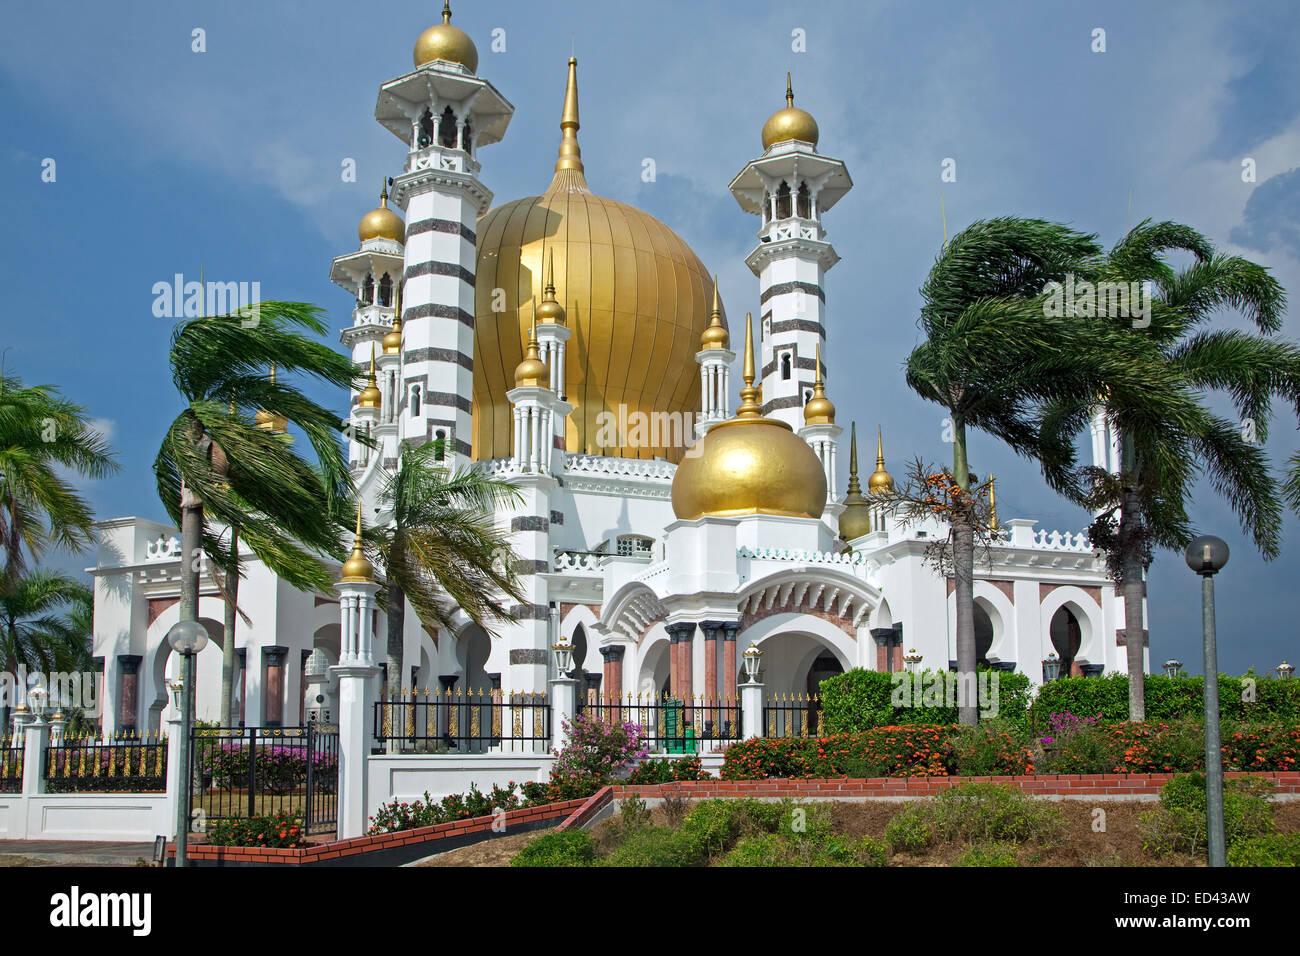 Ubudiah Mosque / Masjid Ubudiah with golden dome in Kuala Kangsar, Perak, Malaysia - Stock Image